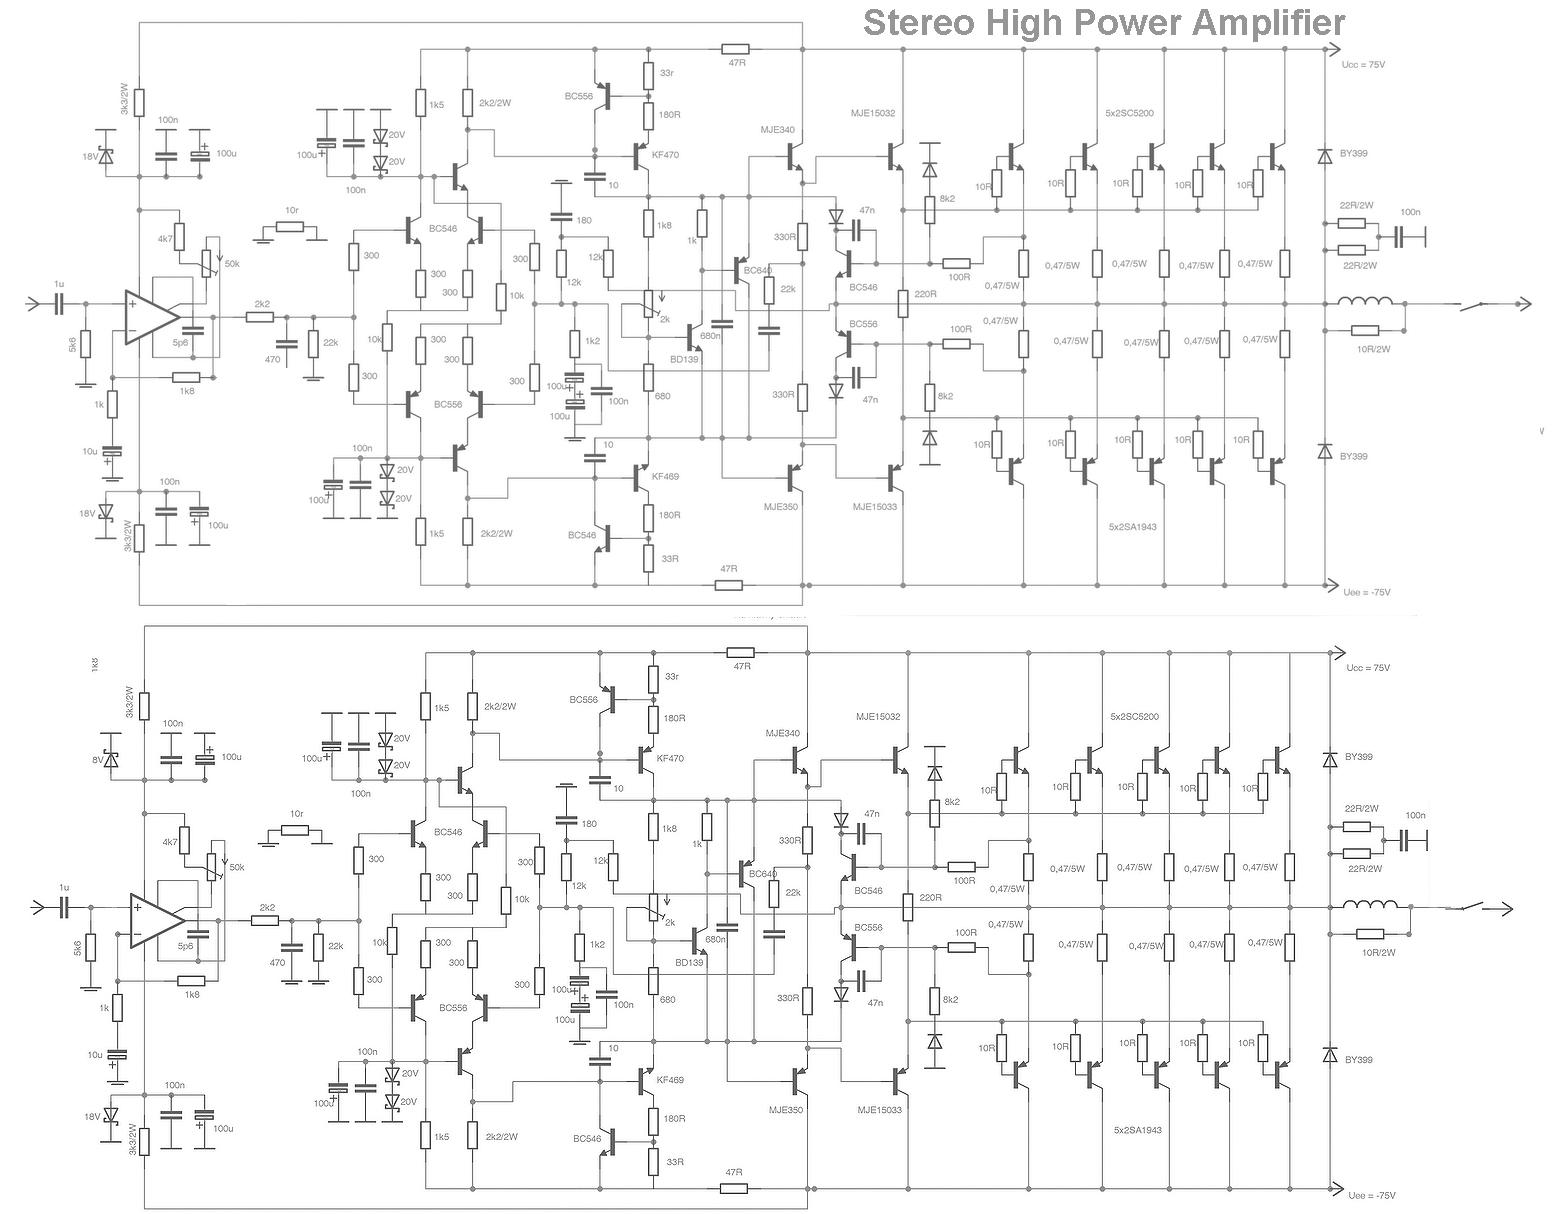 High Power Amplifier Circuit Diagram